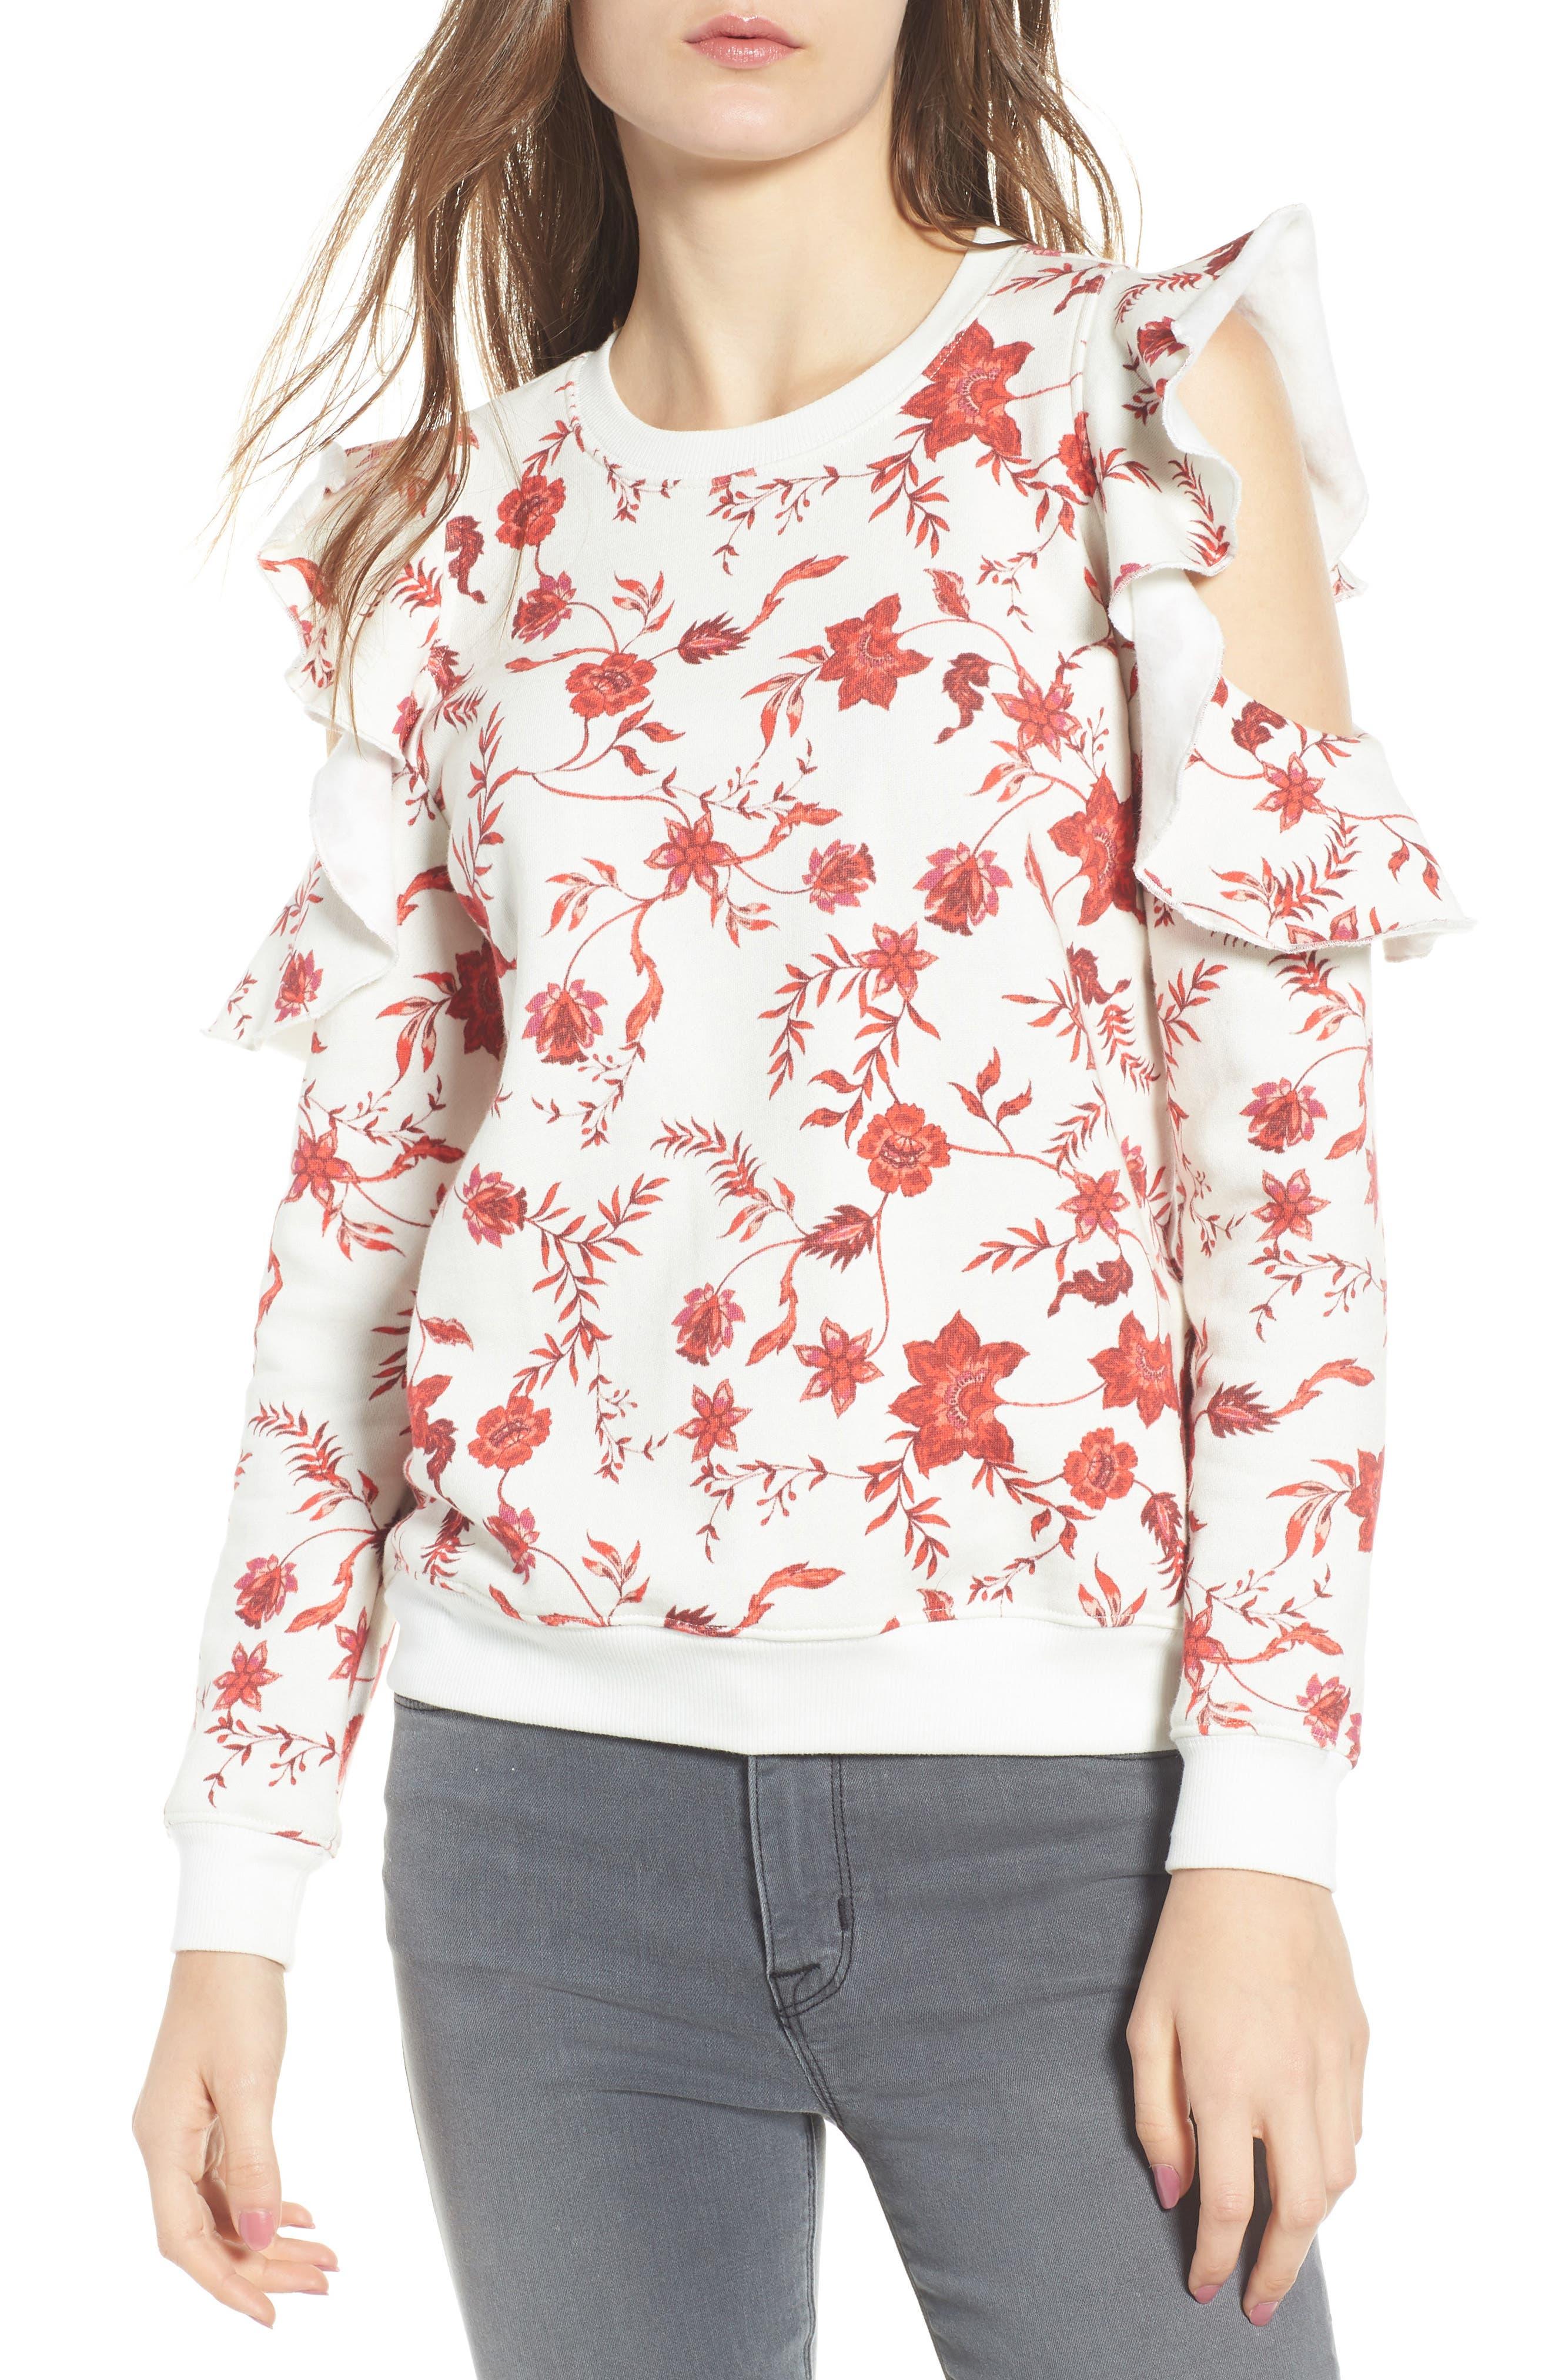 REBECCA MINKOFF Gracie Cold Shoulder Floral Sweatshirt, Main, color, 900